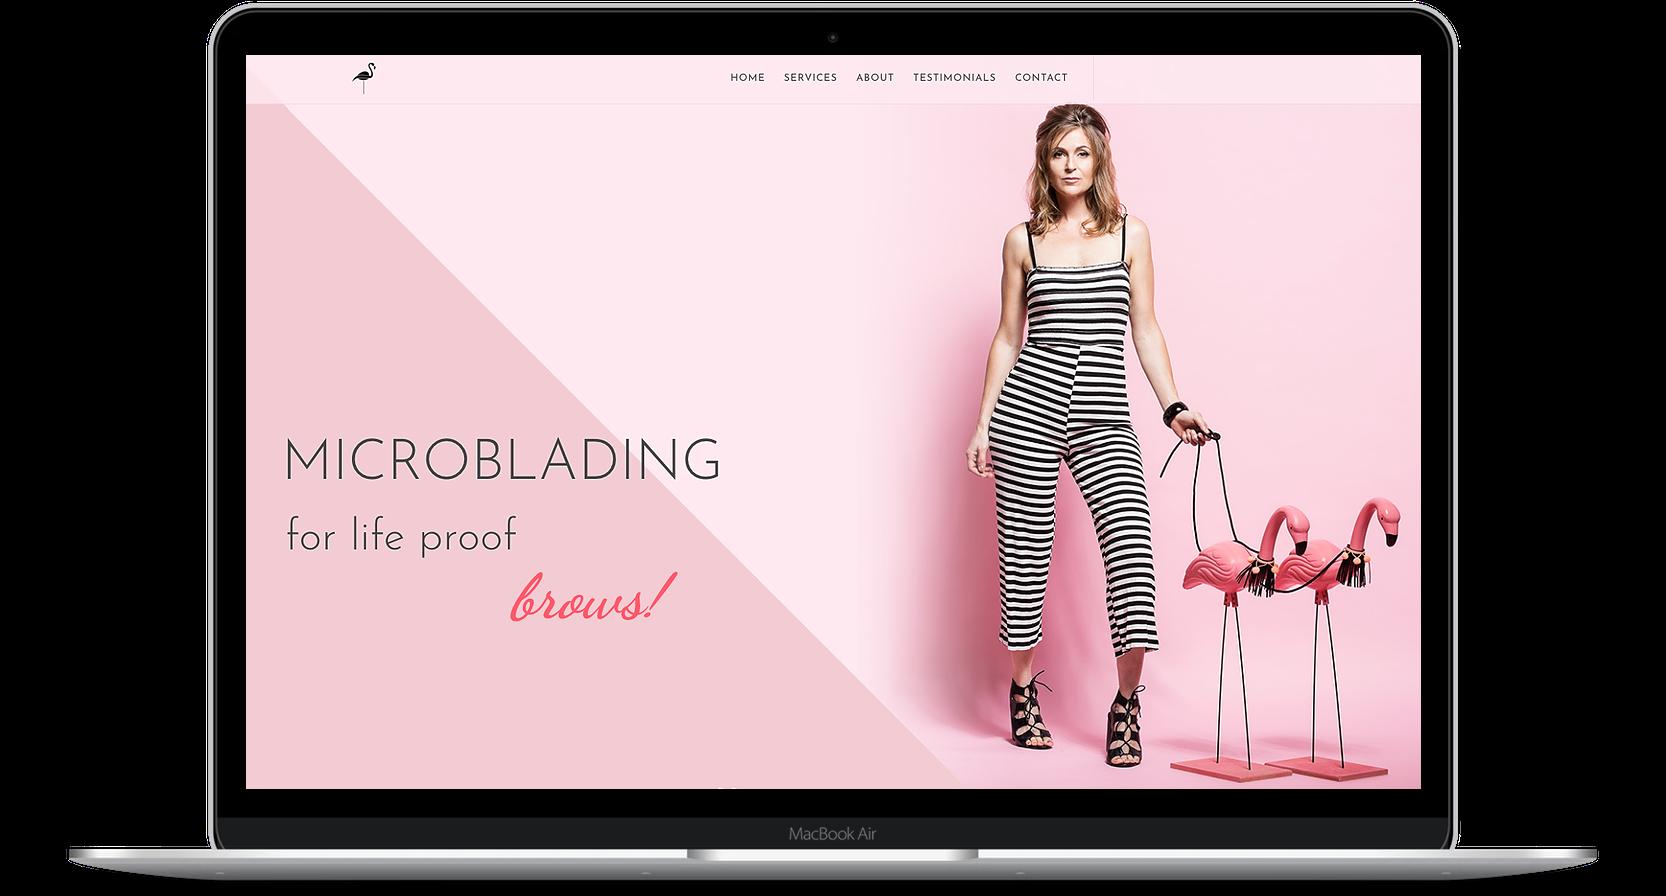 salon-website-design-flamingo-microblading